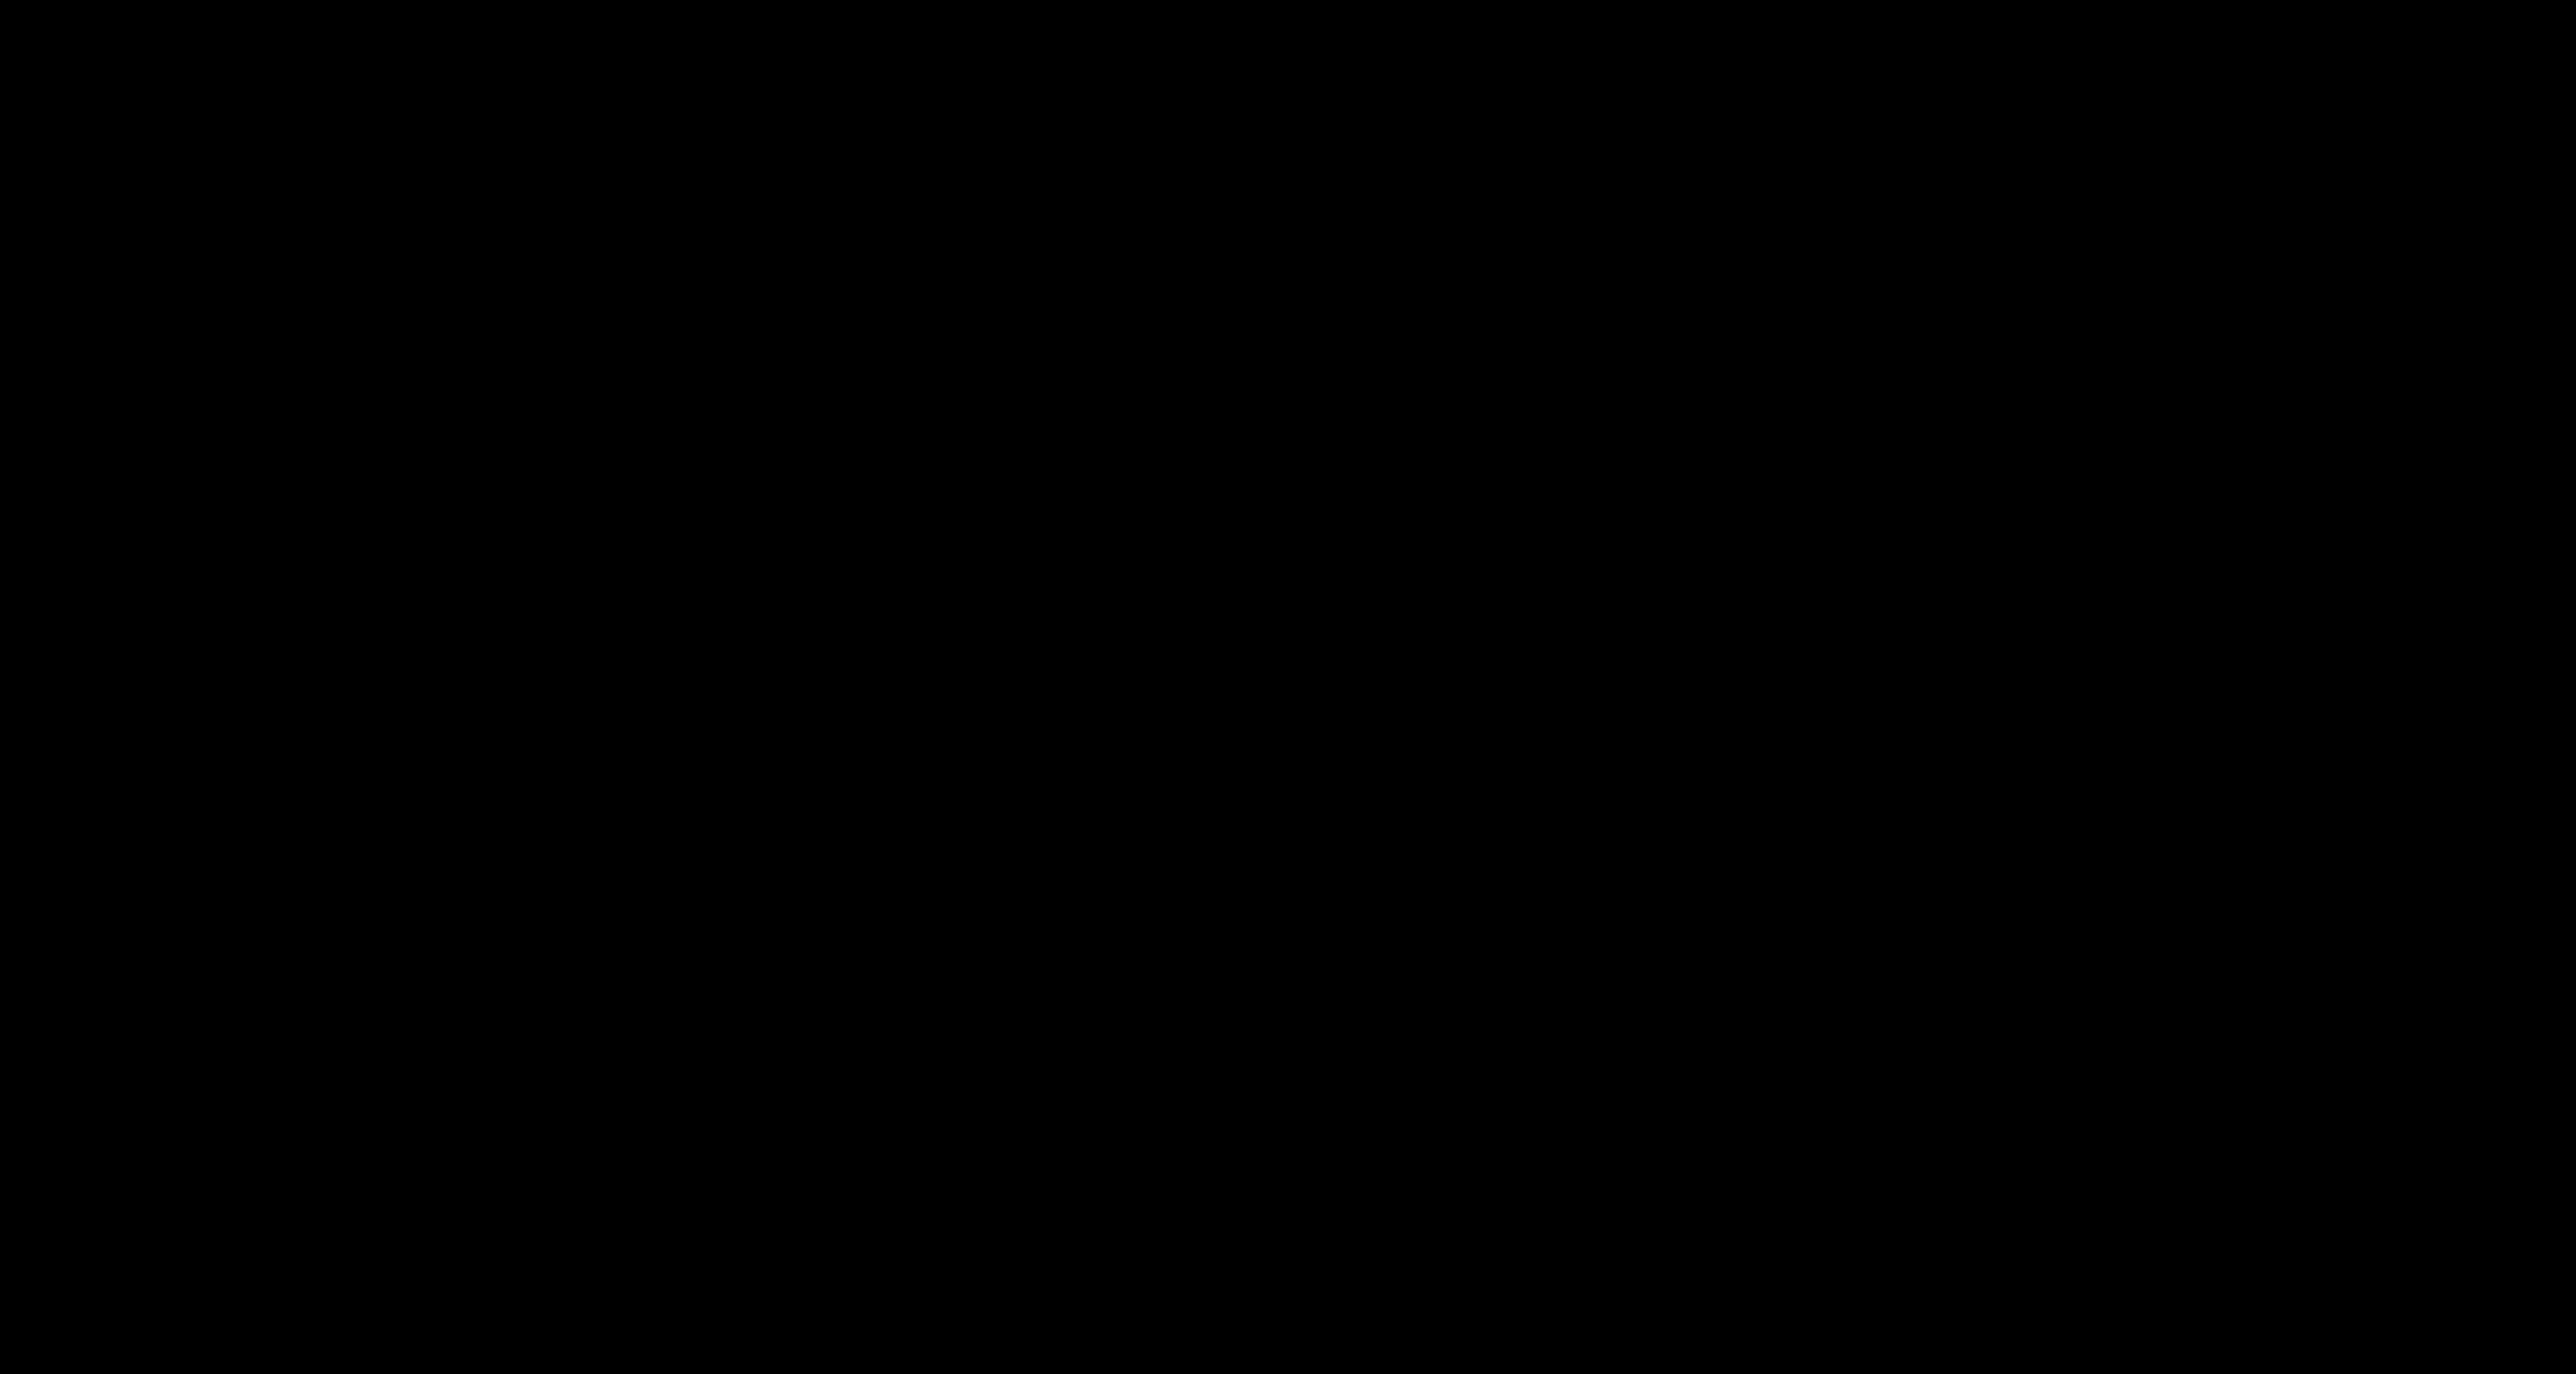 Jaguar S-type manufacturer logo